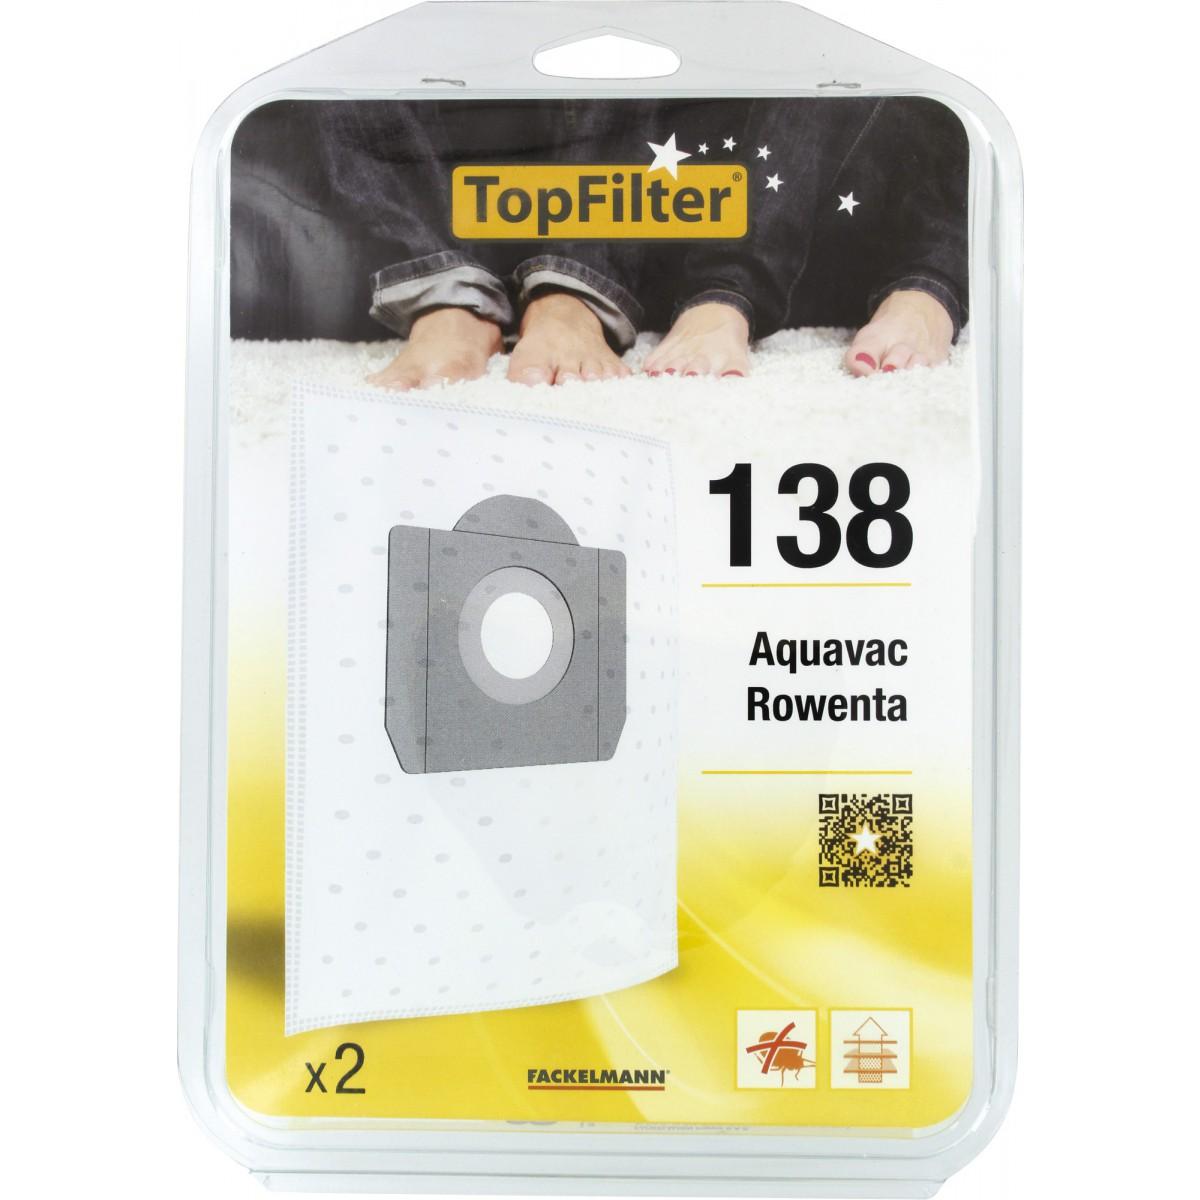 Sac aspirateur industriel - Rowenta - 138 - Vendu par 2